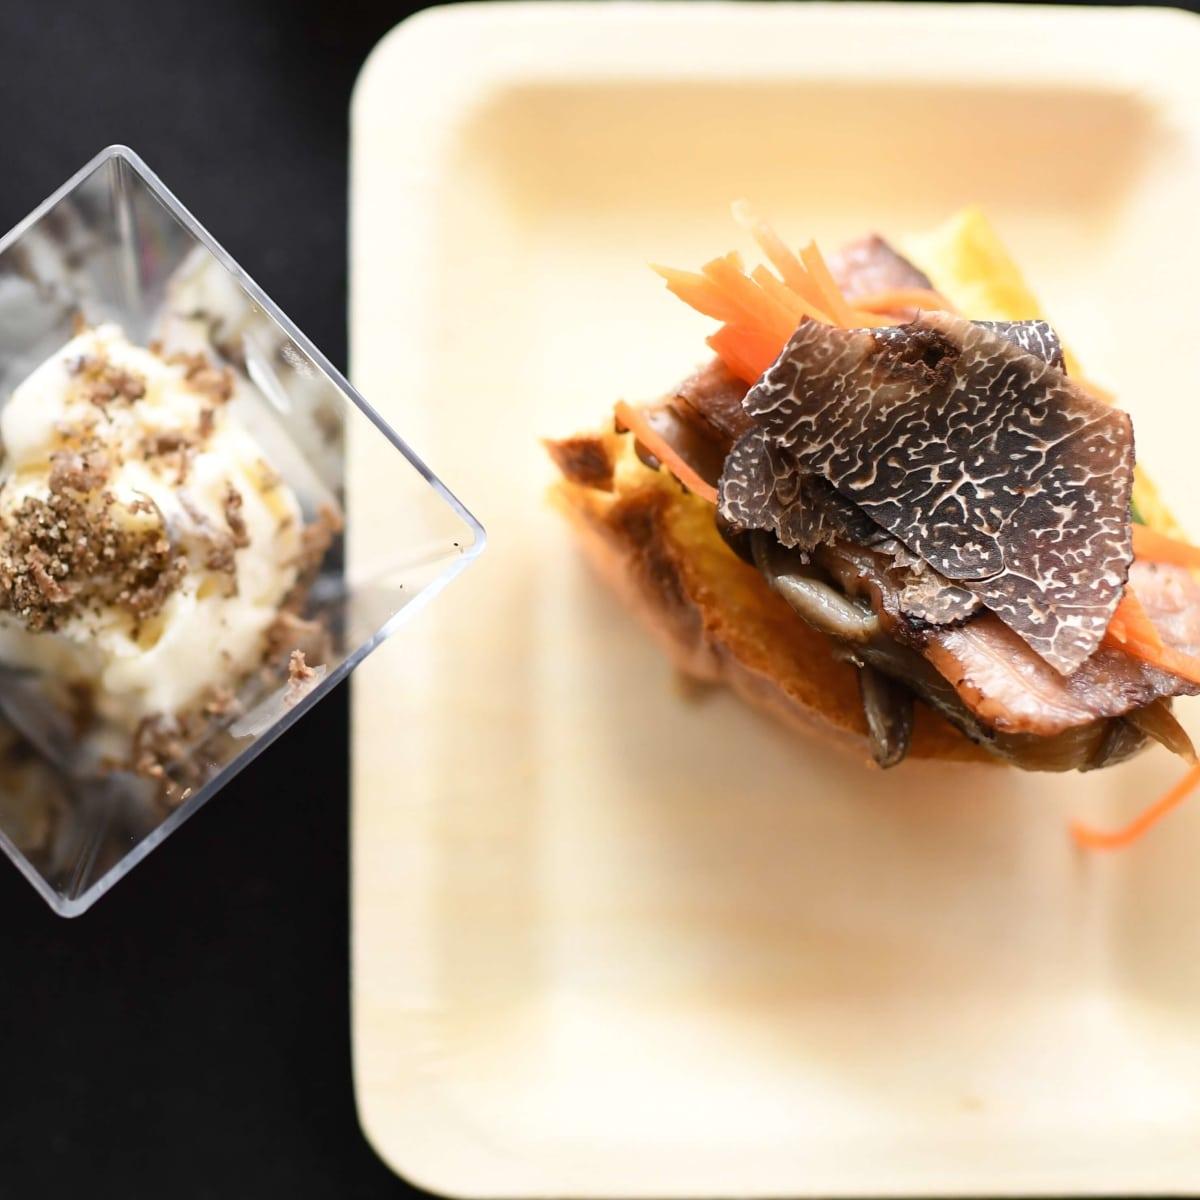 Truffle Masters 2017 first place winner Kata Robata honey truffle ice cream and open face truffle banh mi